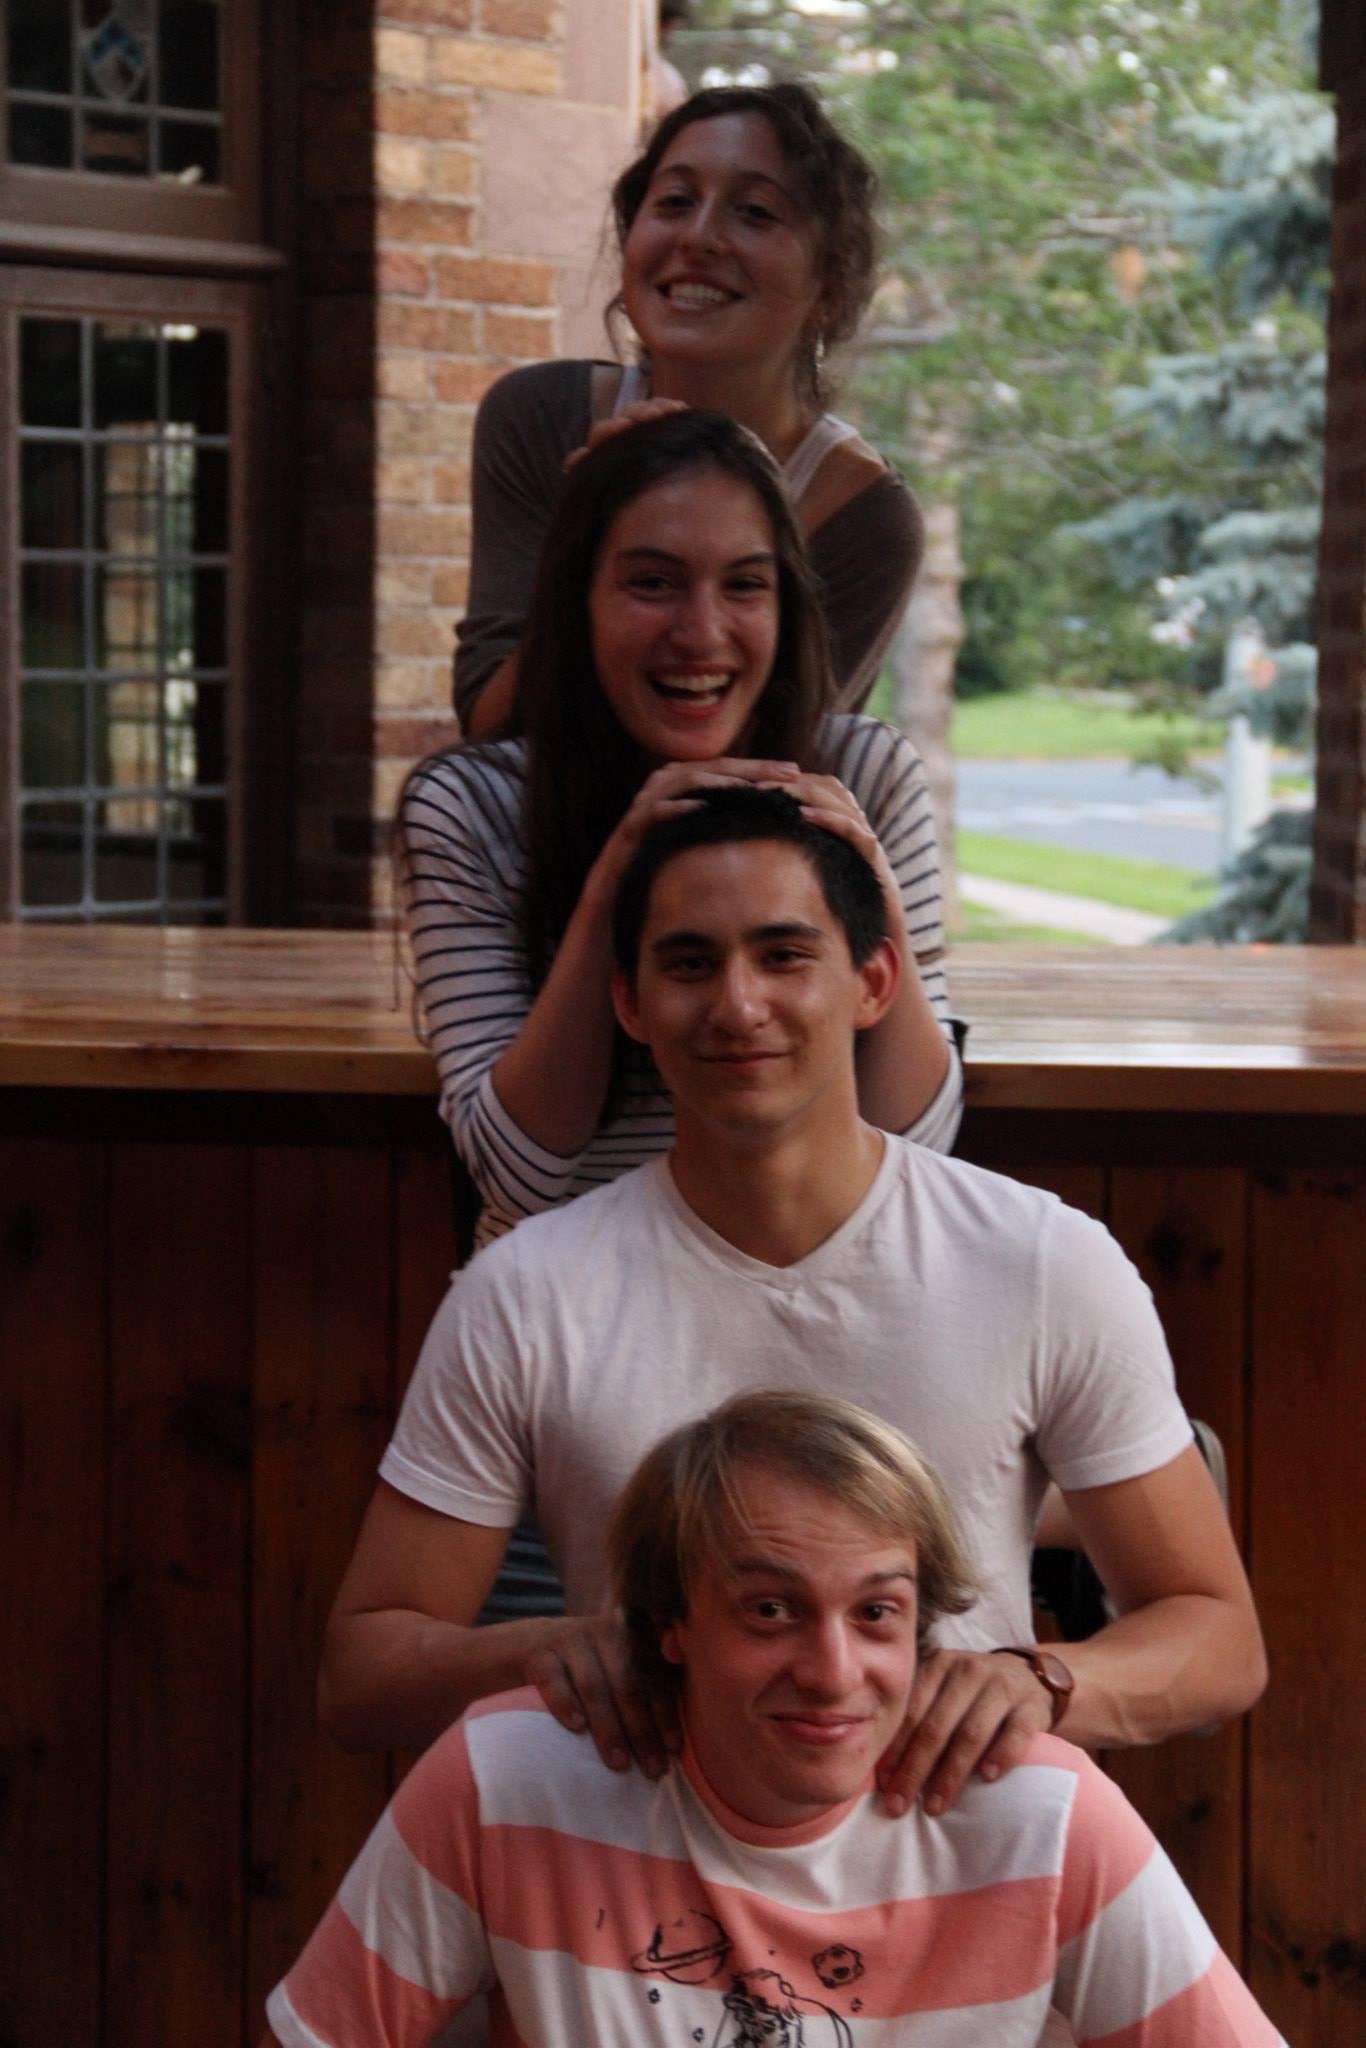 Lily Myers, Kate Weiner, Sean Winnik Tennessee Mowrey